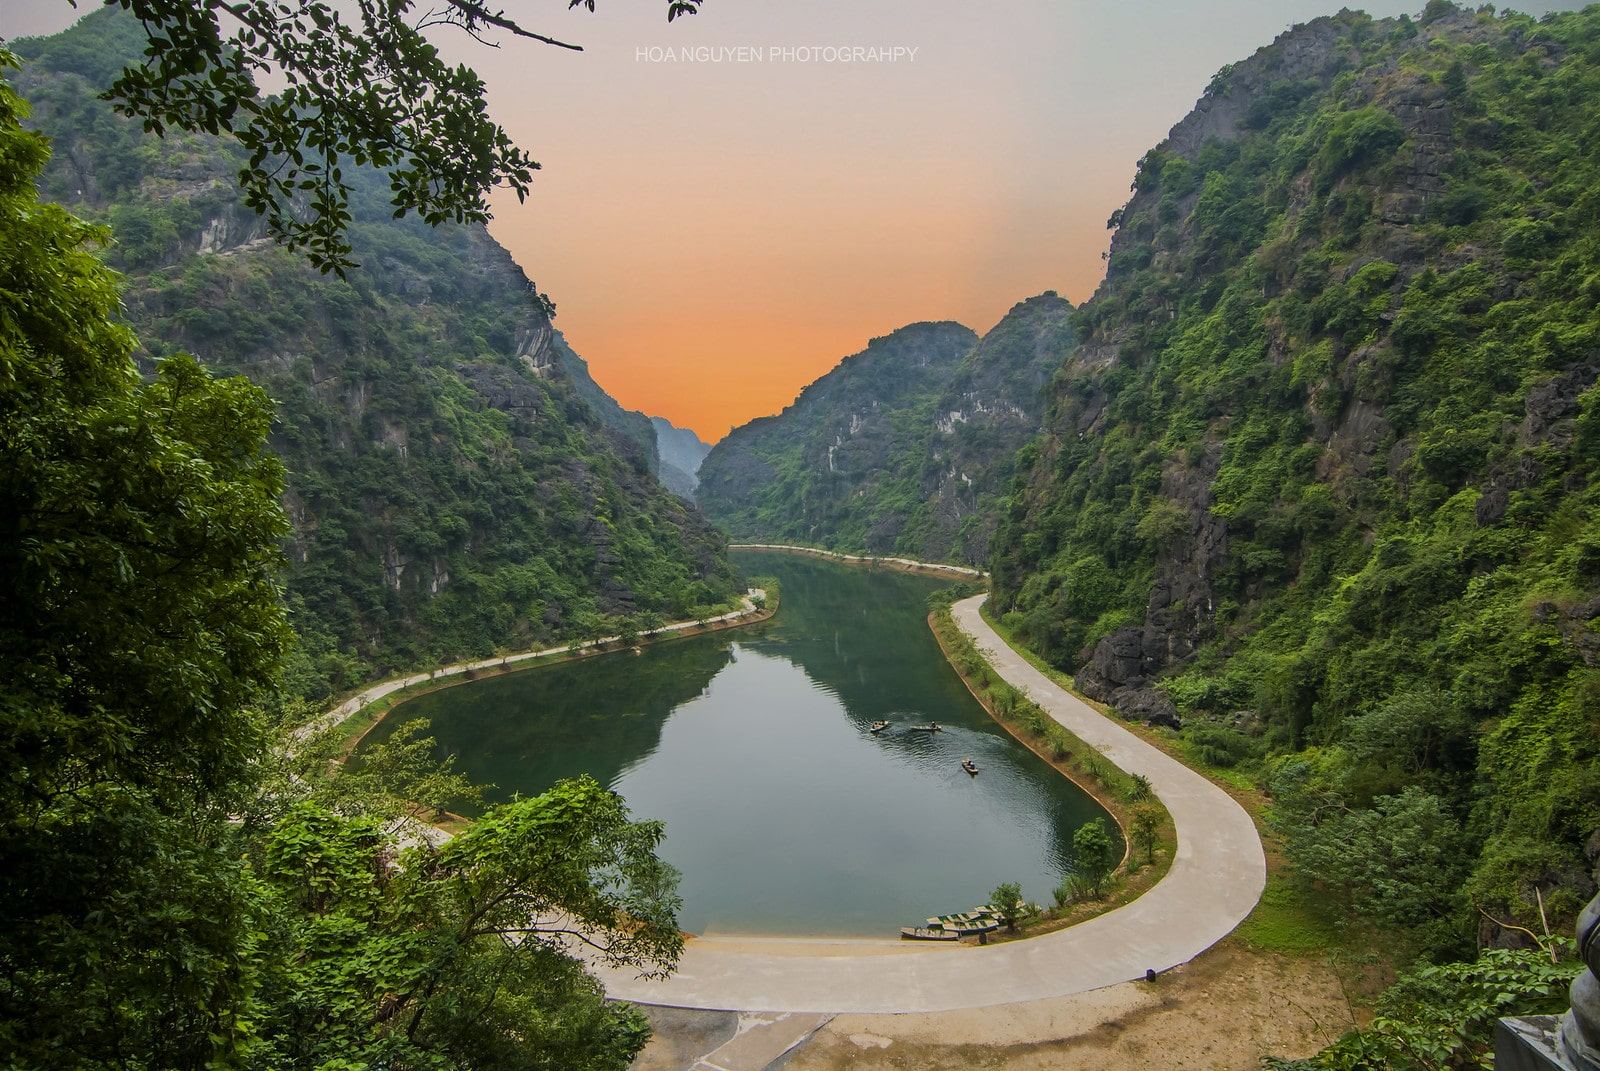 Image of Am Tien Valley in Trang An, Ninh Binh, Vietnam